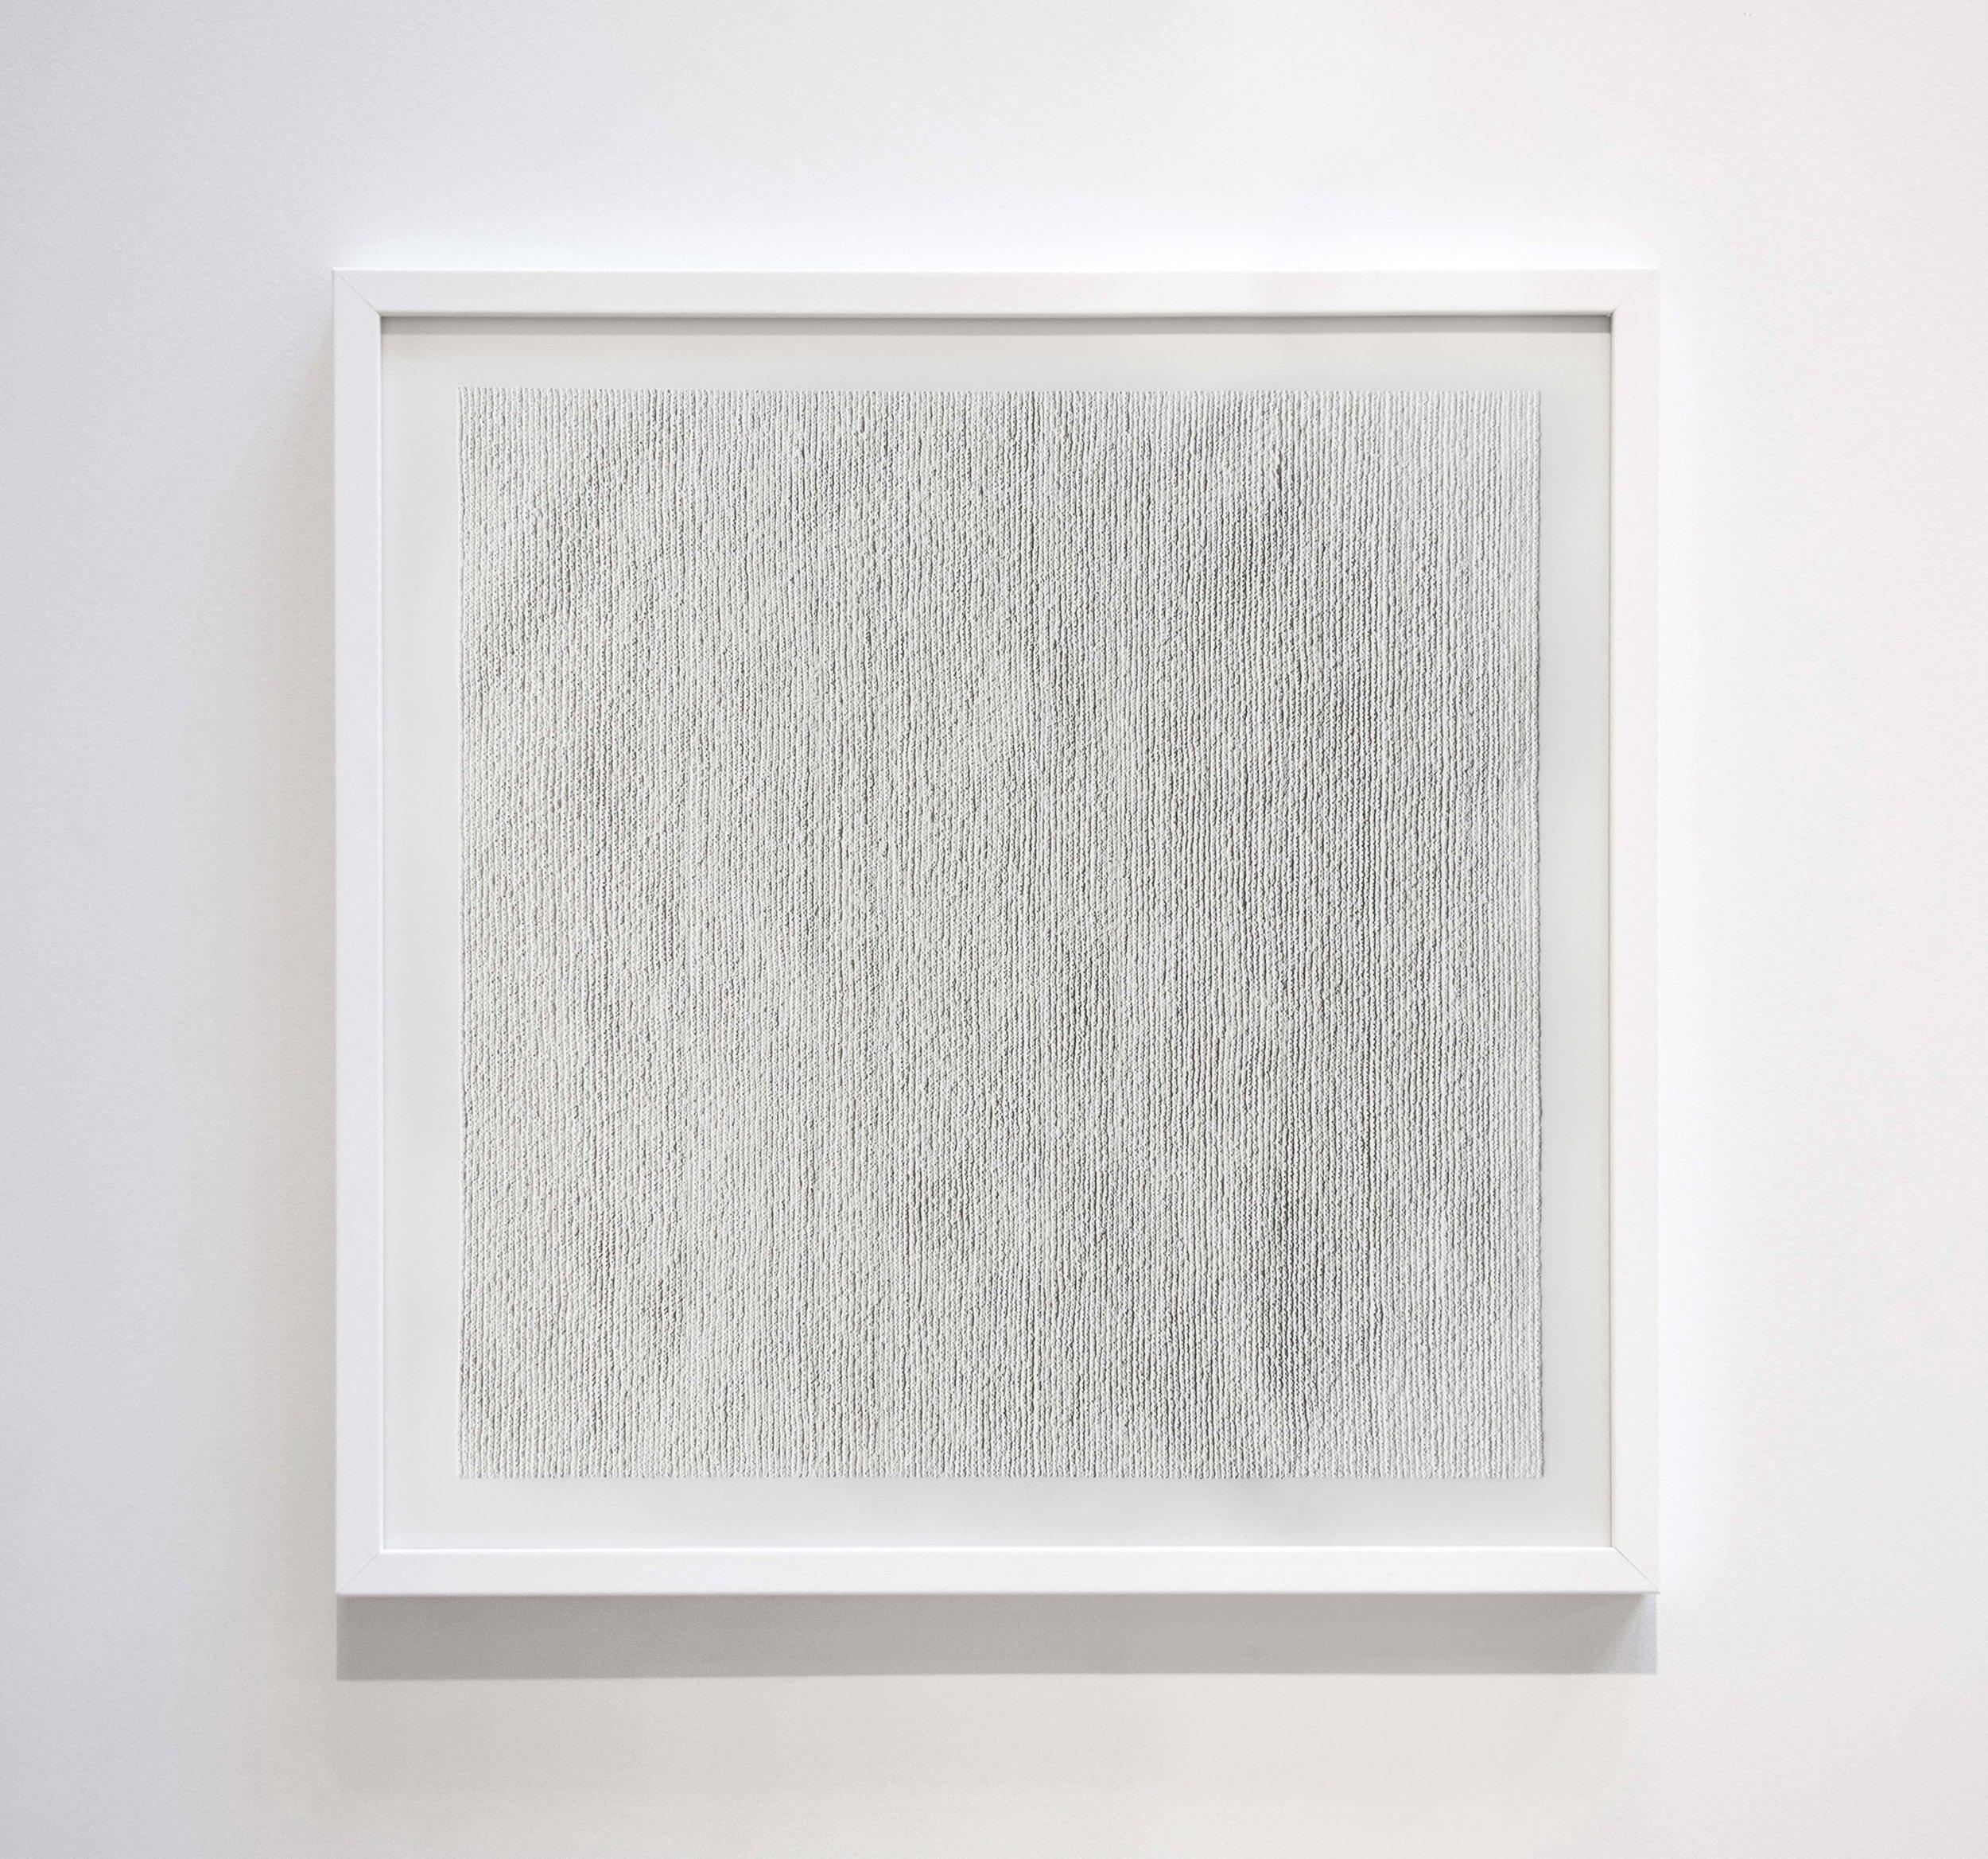 Antonin_Anzil-Square-4-vue2-low.jpg